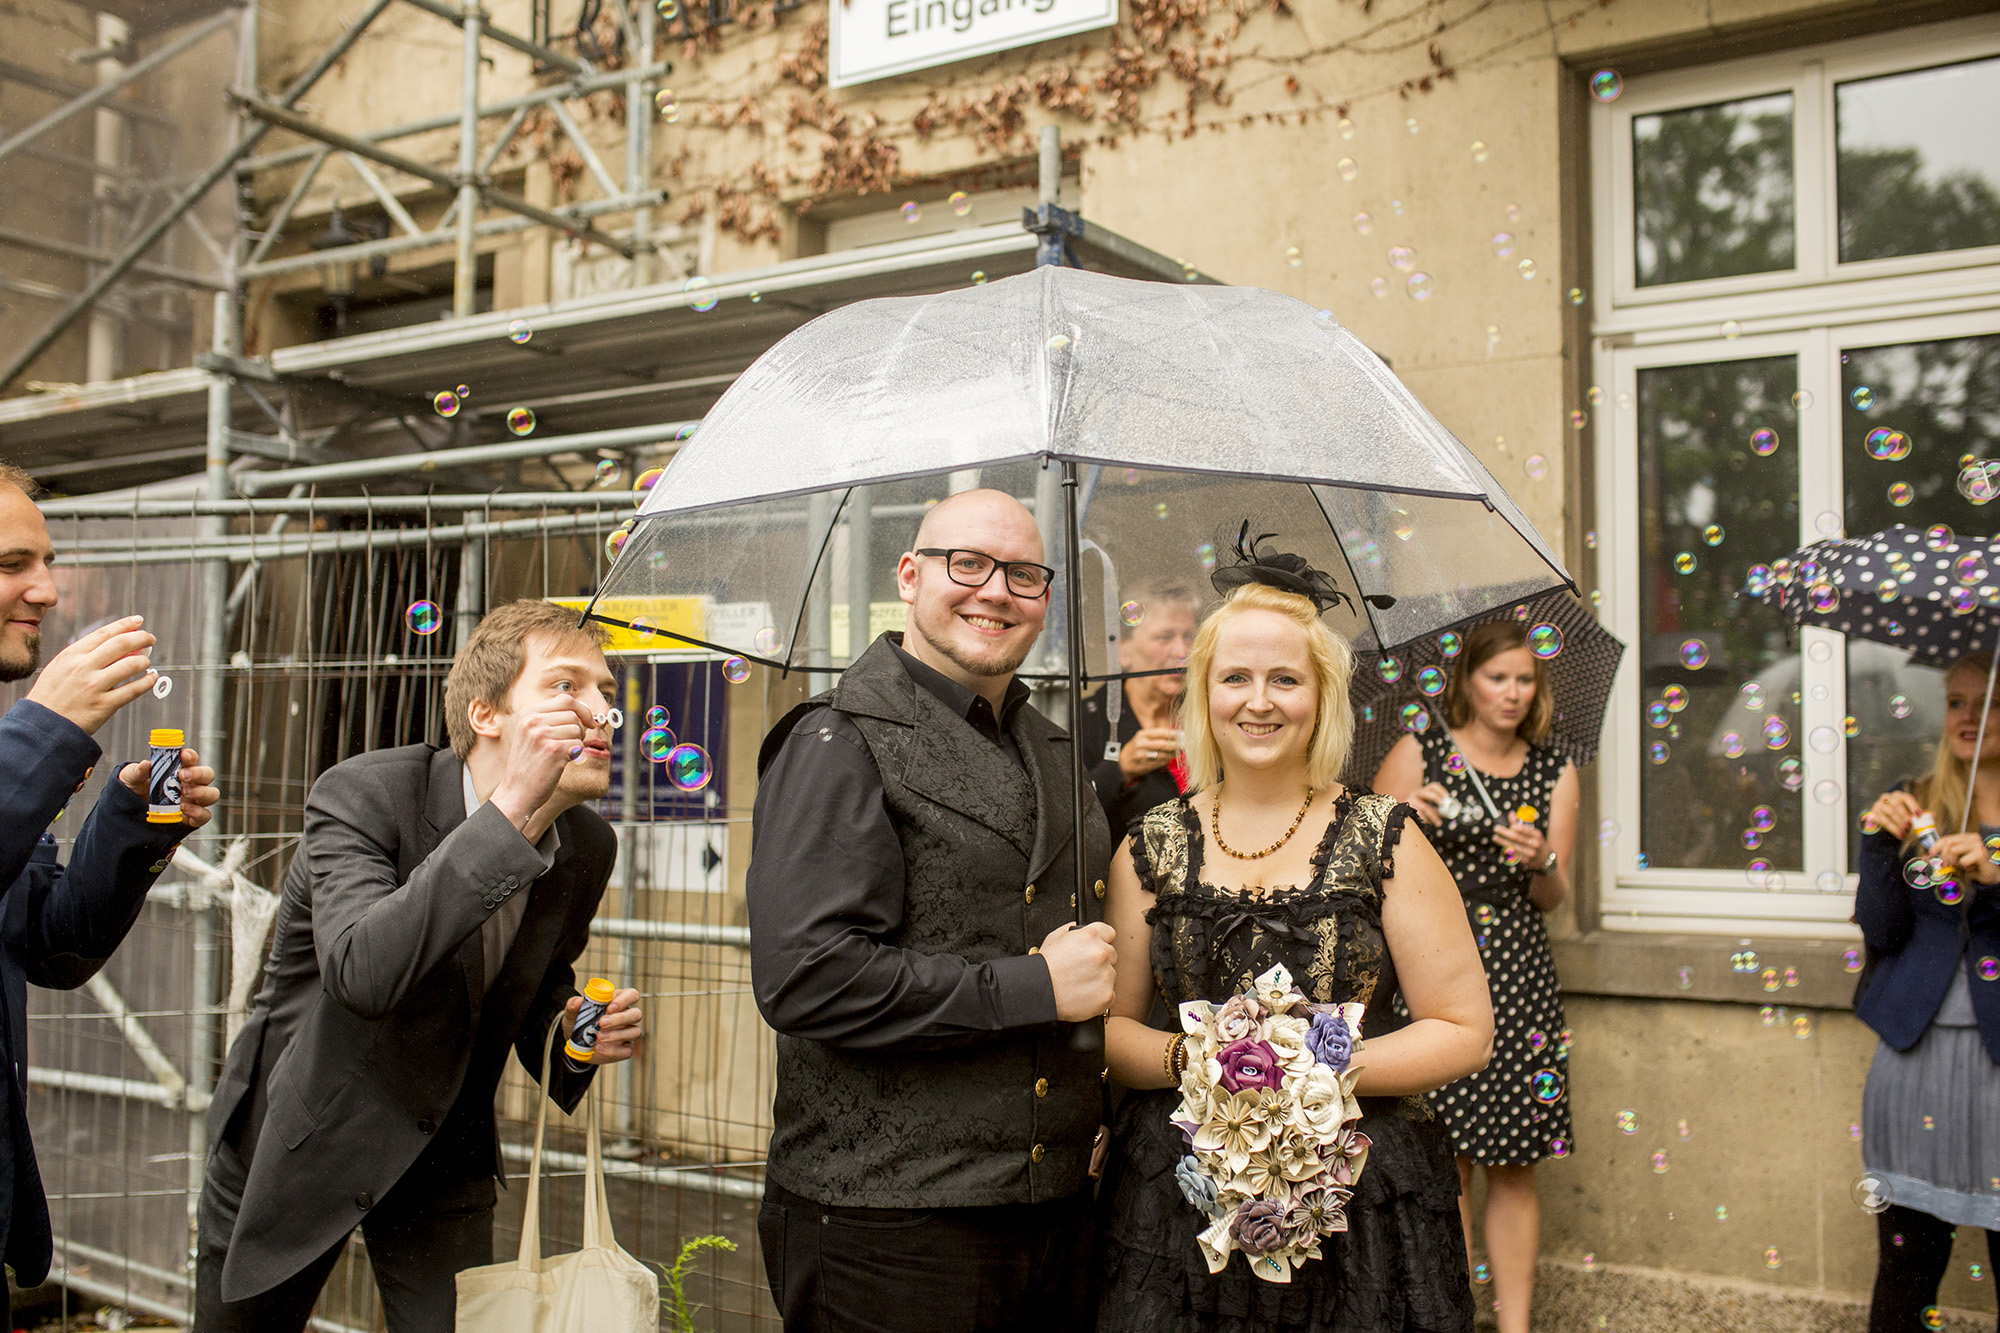 Seriously_Sabrina_Photography_Essen_Germany_RocknRoll_Hochzeit_Wedding_PatrickJenny49.jpg